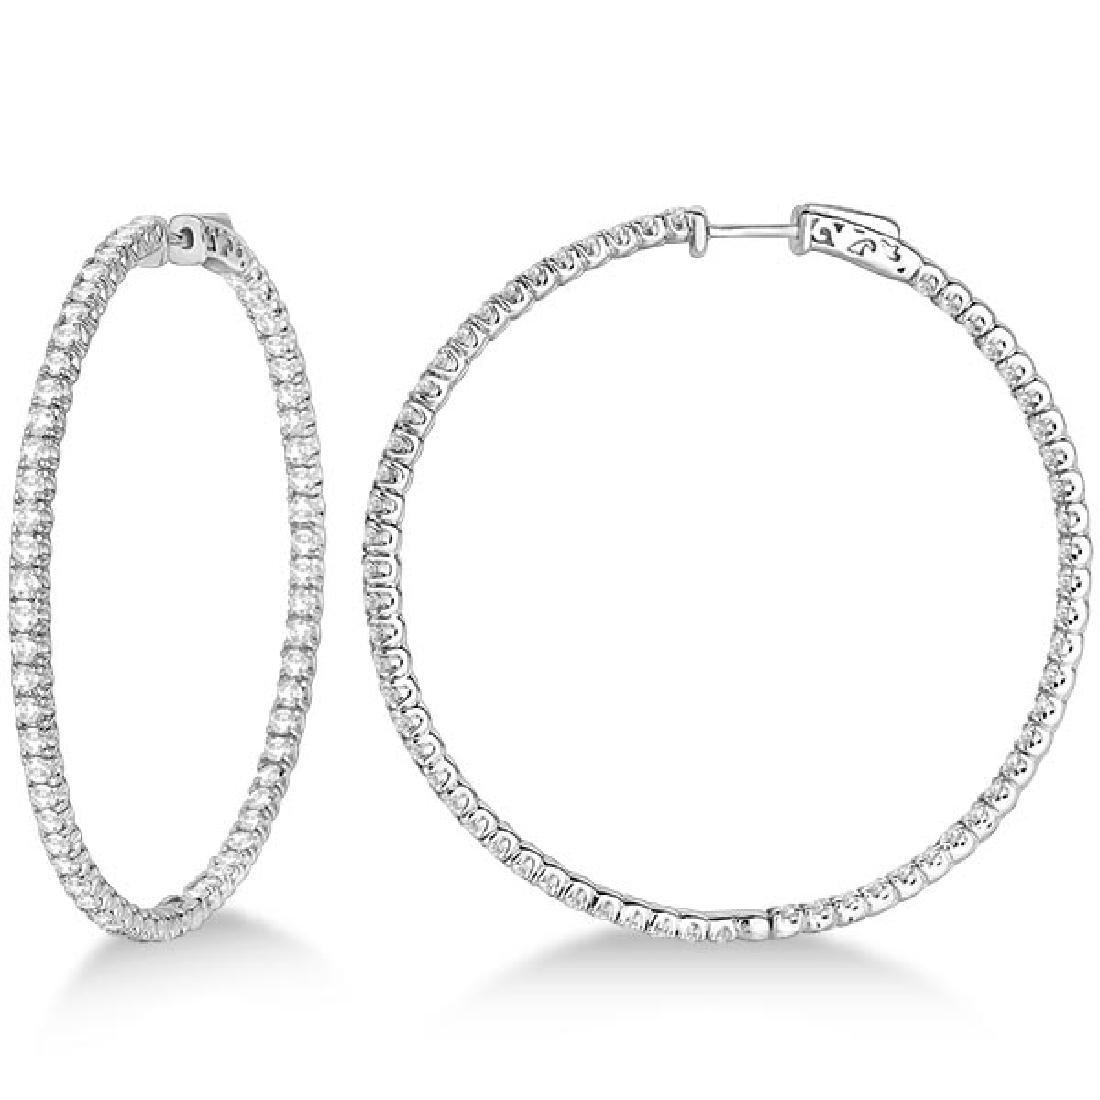 X-Large Round Diamond Hoop Earrings 14k White Gold (5.1